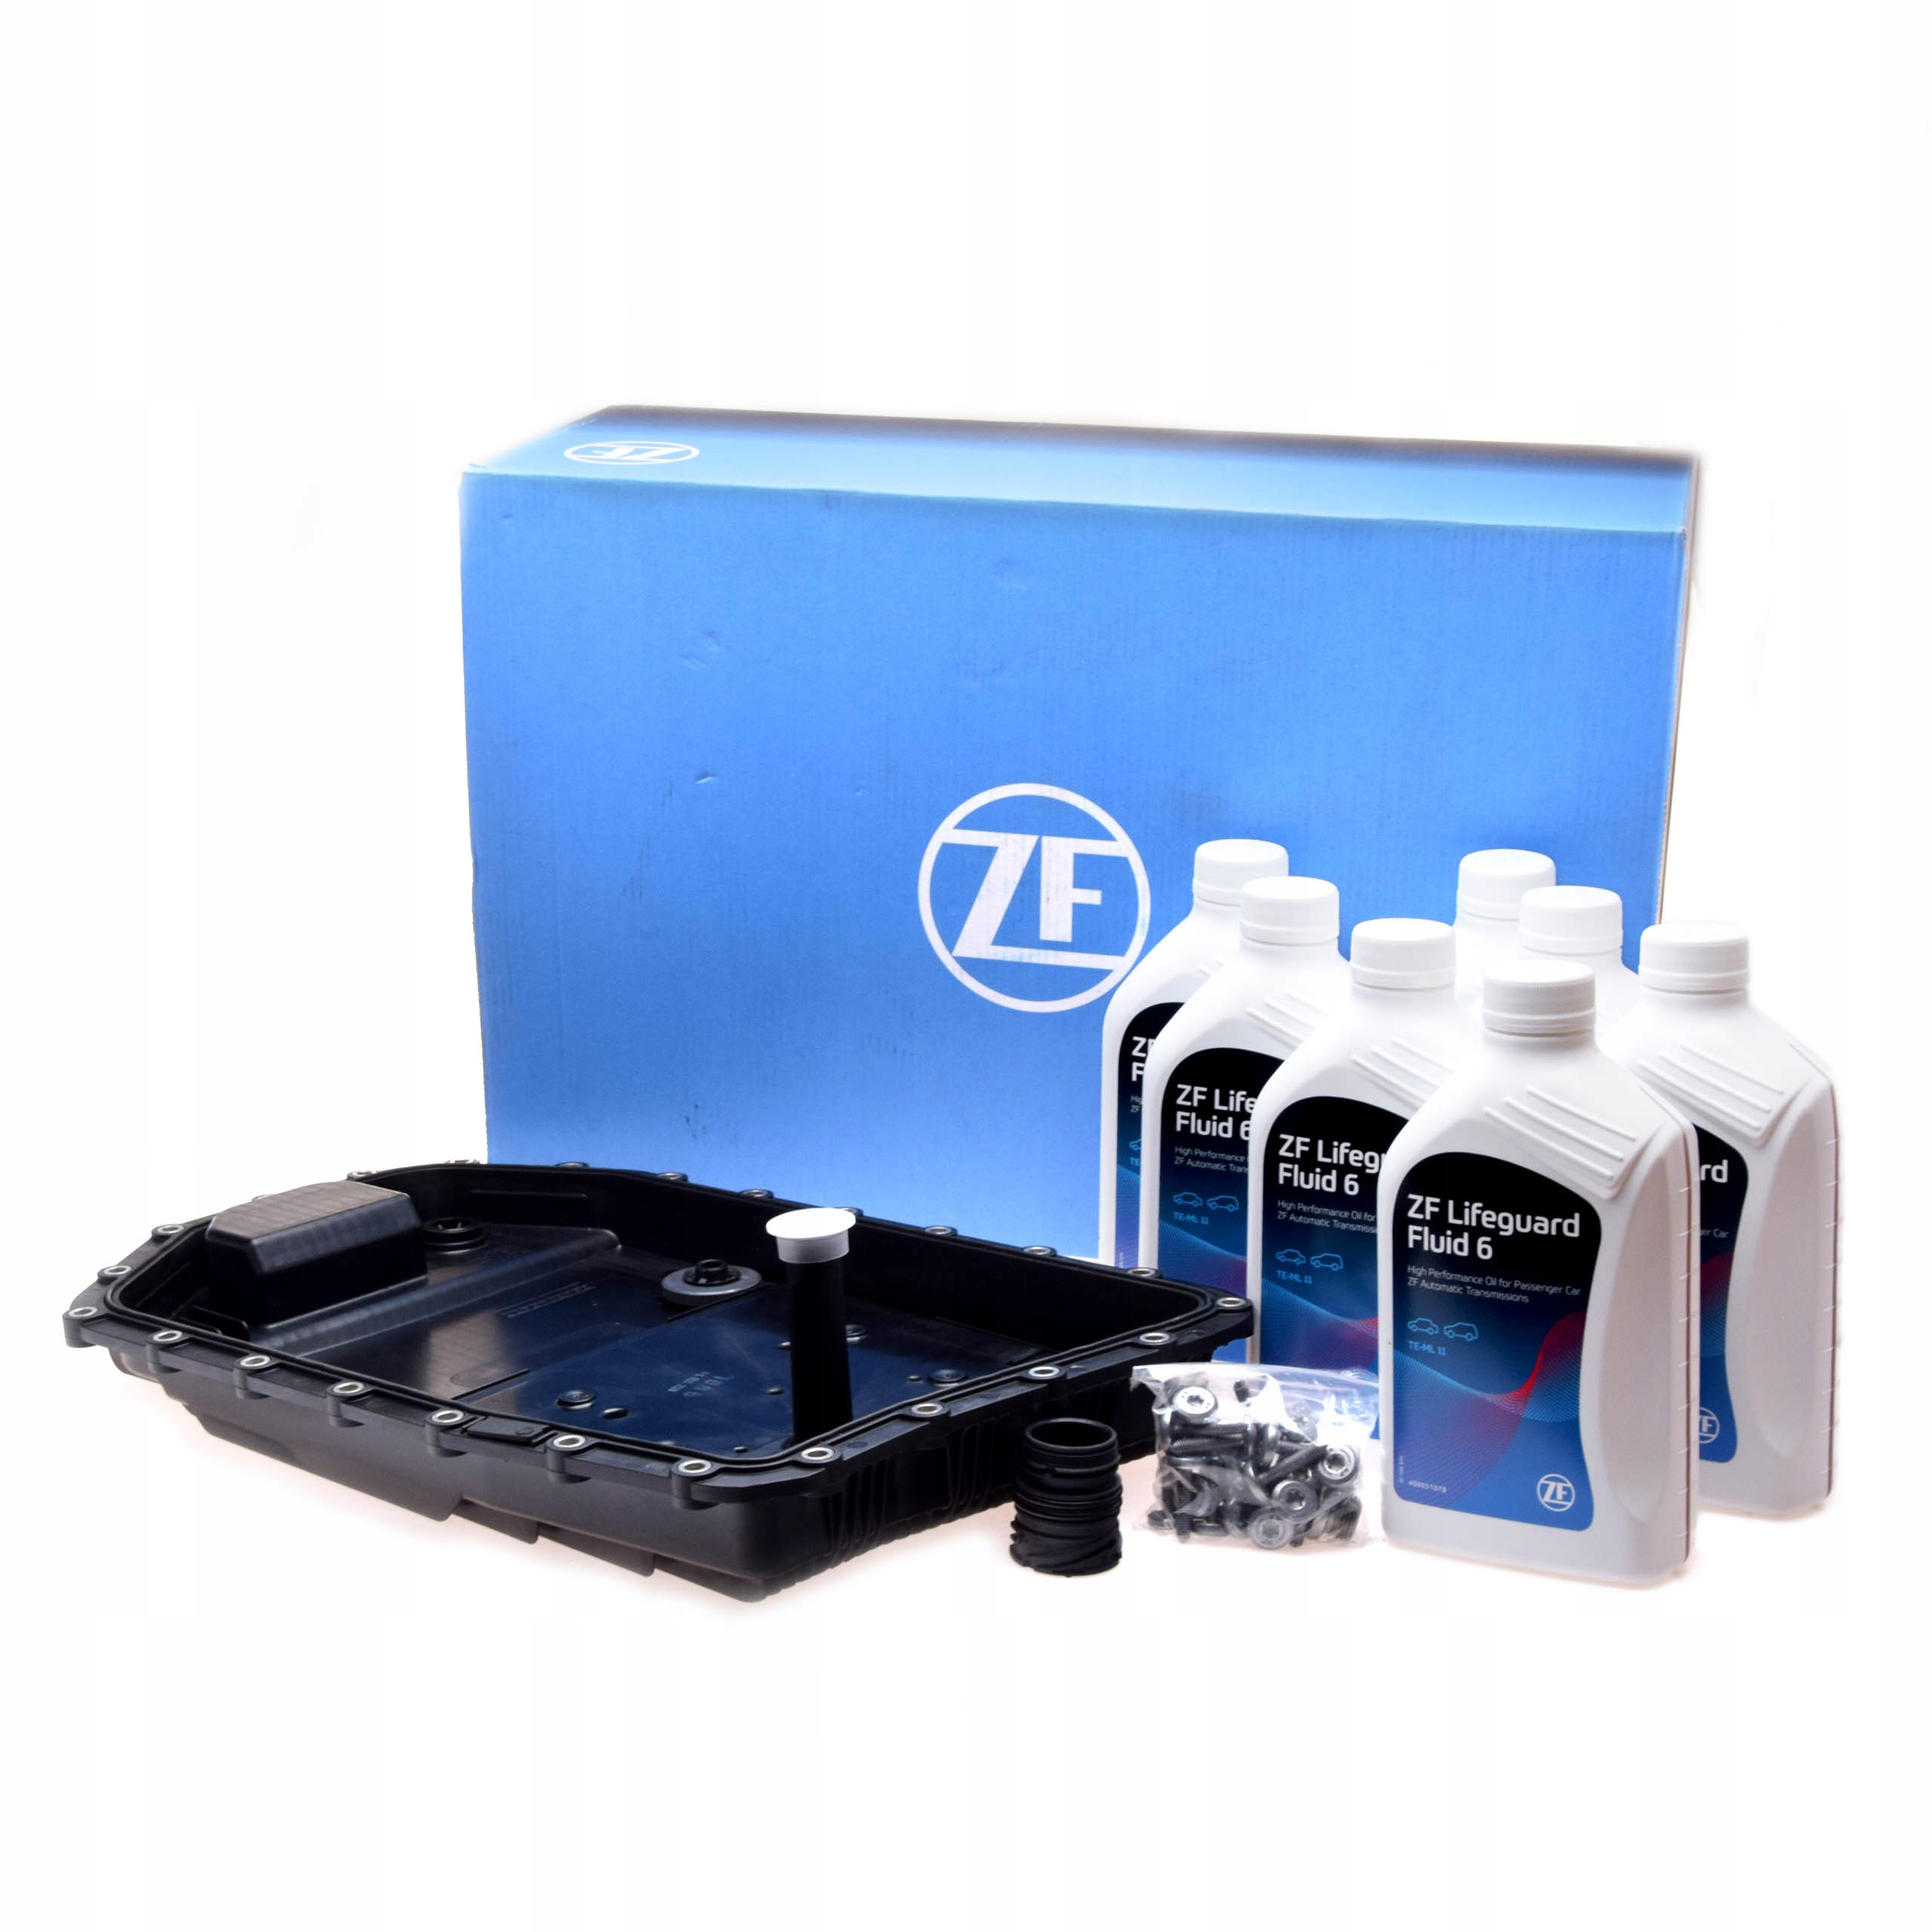 zf комплект коробки фильтр масло bmw e90 6hp19 6hp21